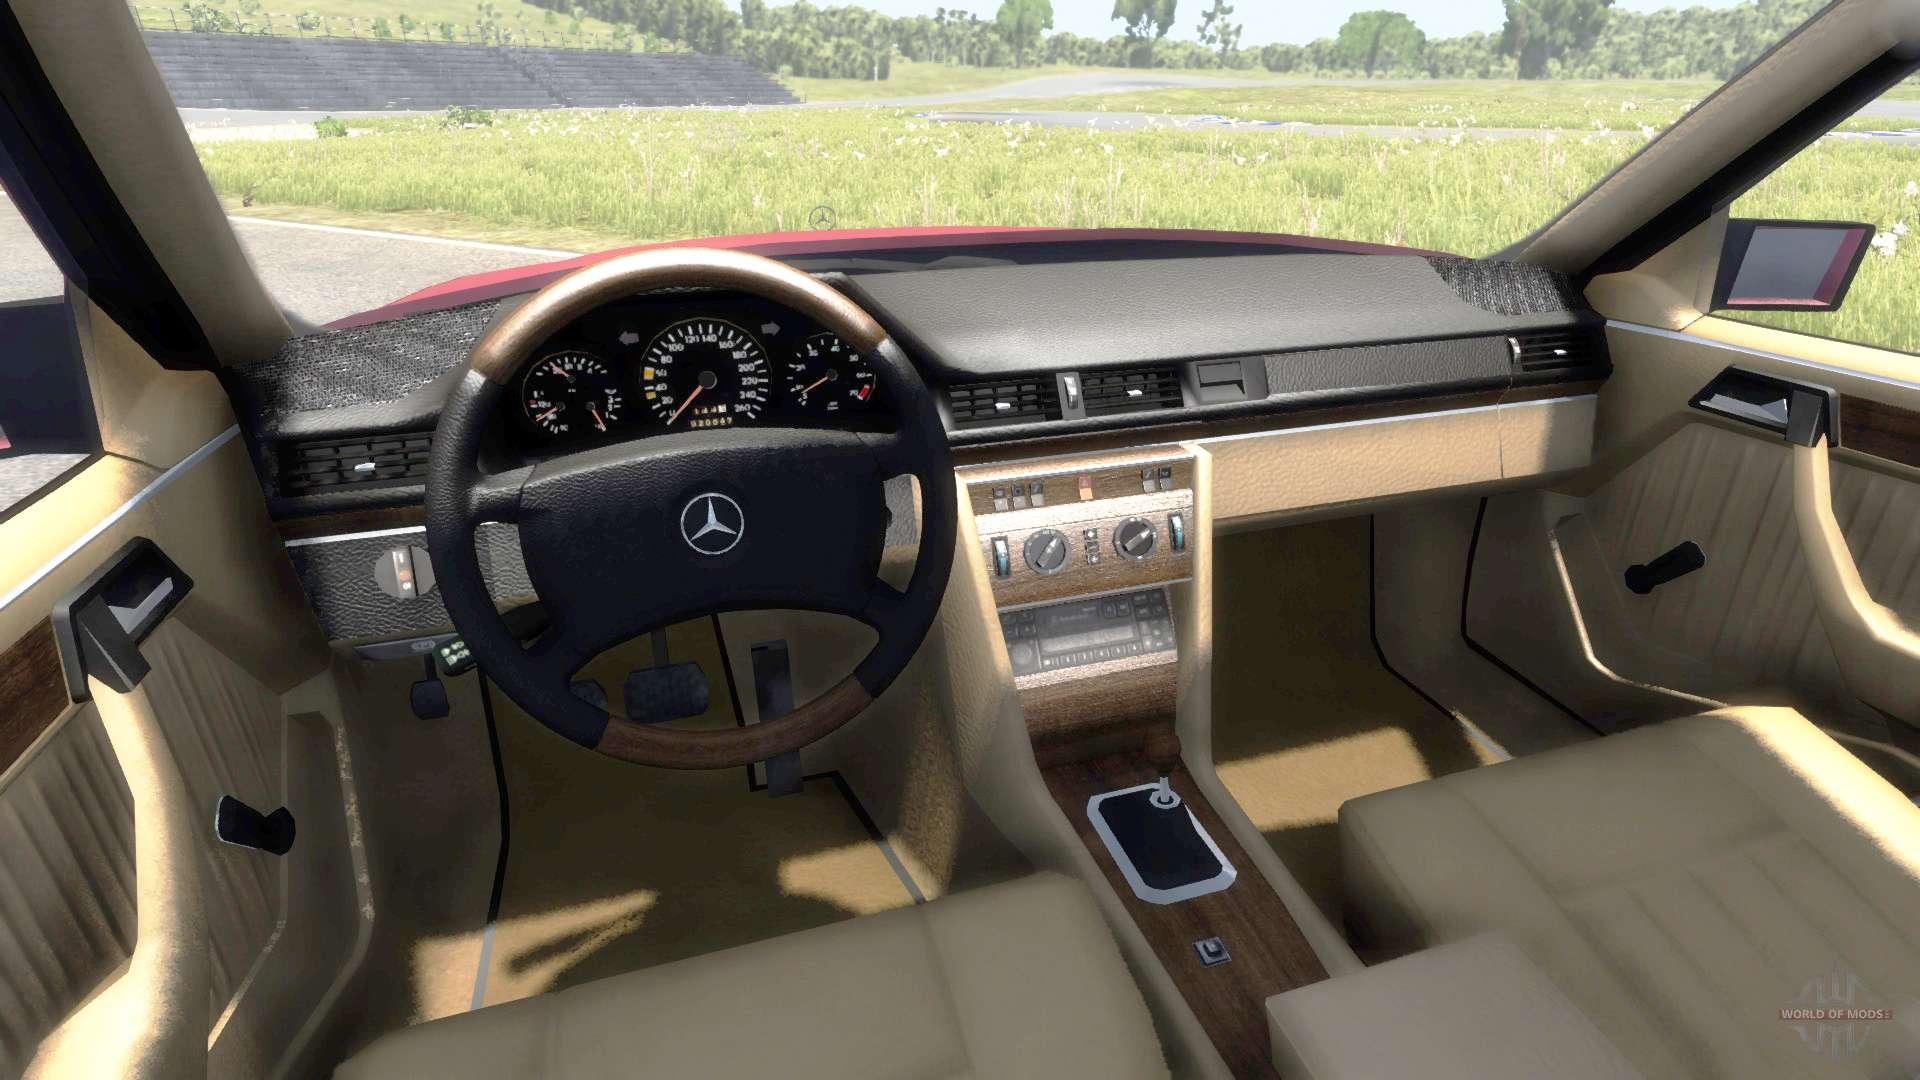 Mercedes Benz C Class Video Download